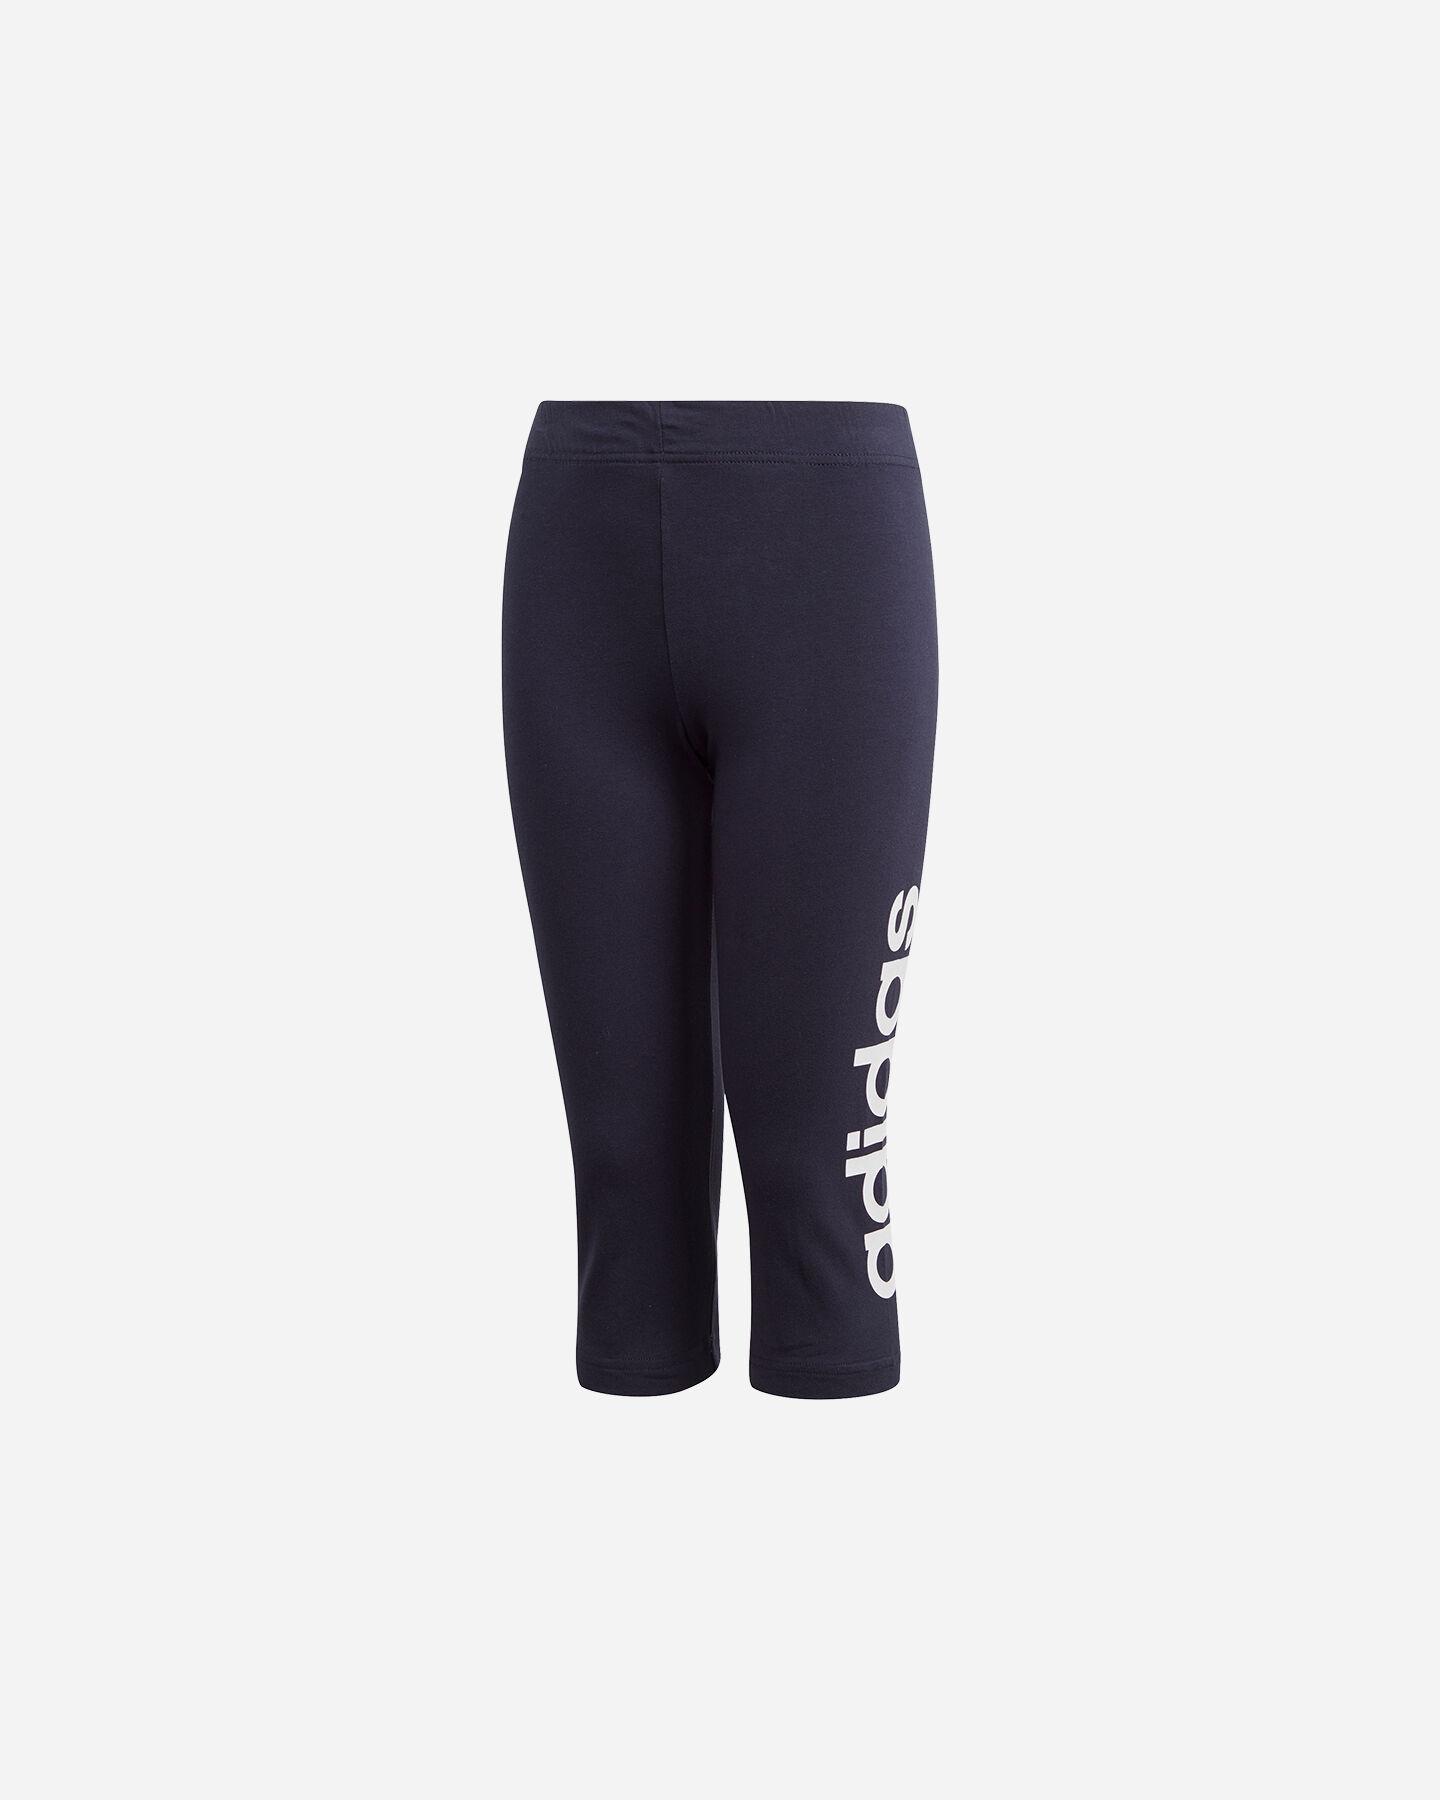 vendita calda online 985c6 4f235 T Shirt Piumini Pantaloni E Costumi Da Bambino Bambino ...